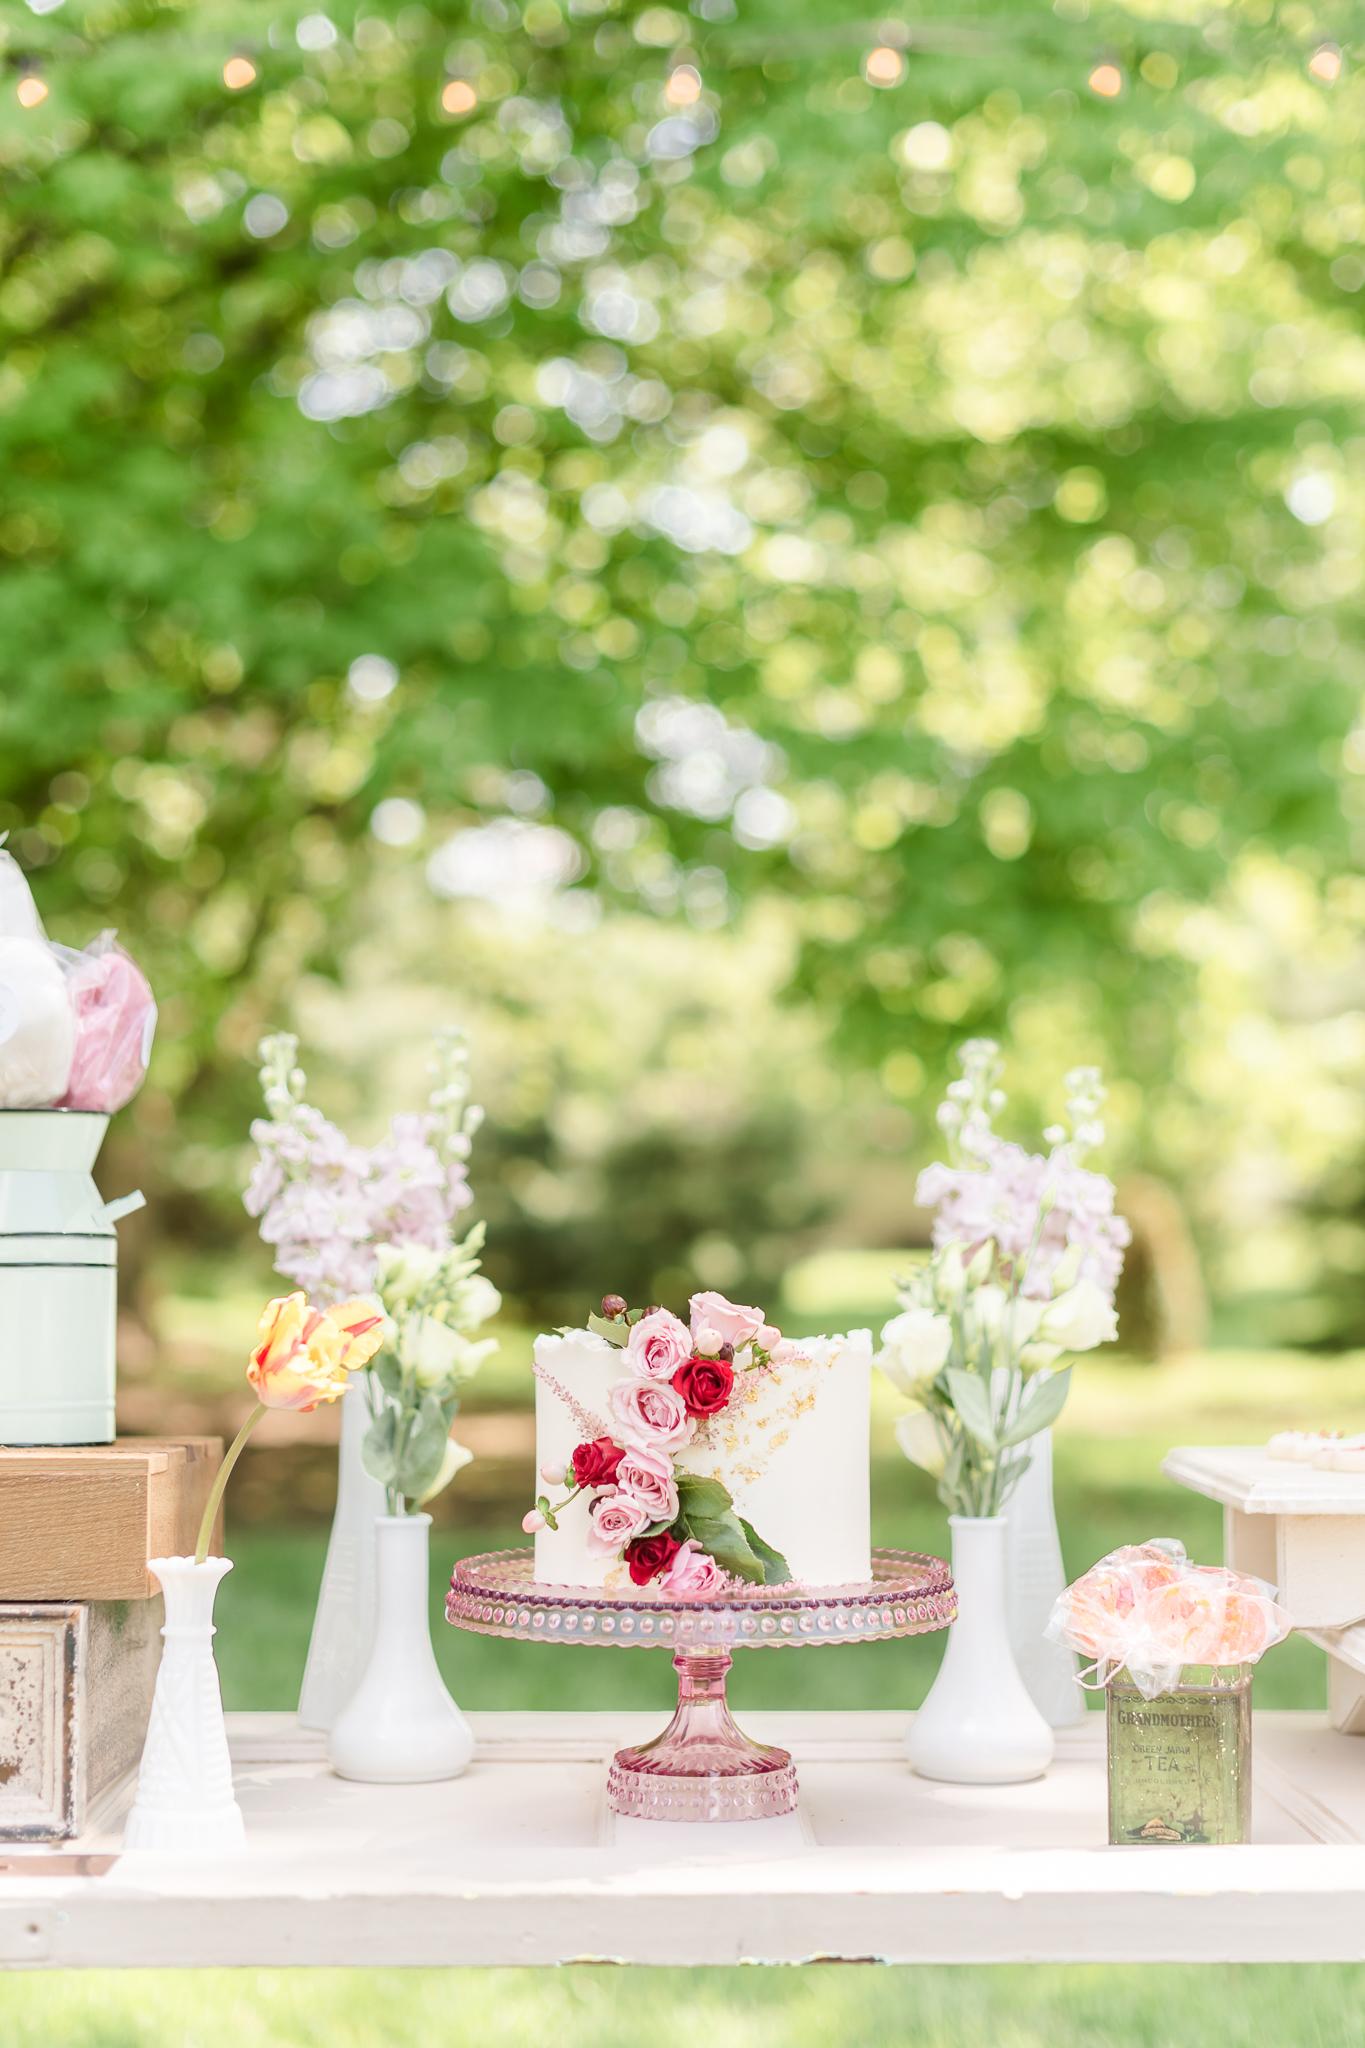 Mustard Seed Gardens Wedding Indianapolis Noblesvile Fishers Wedding Photographer-80.jpg